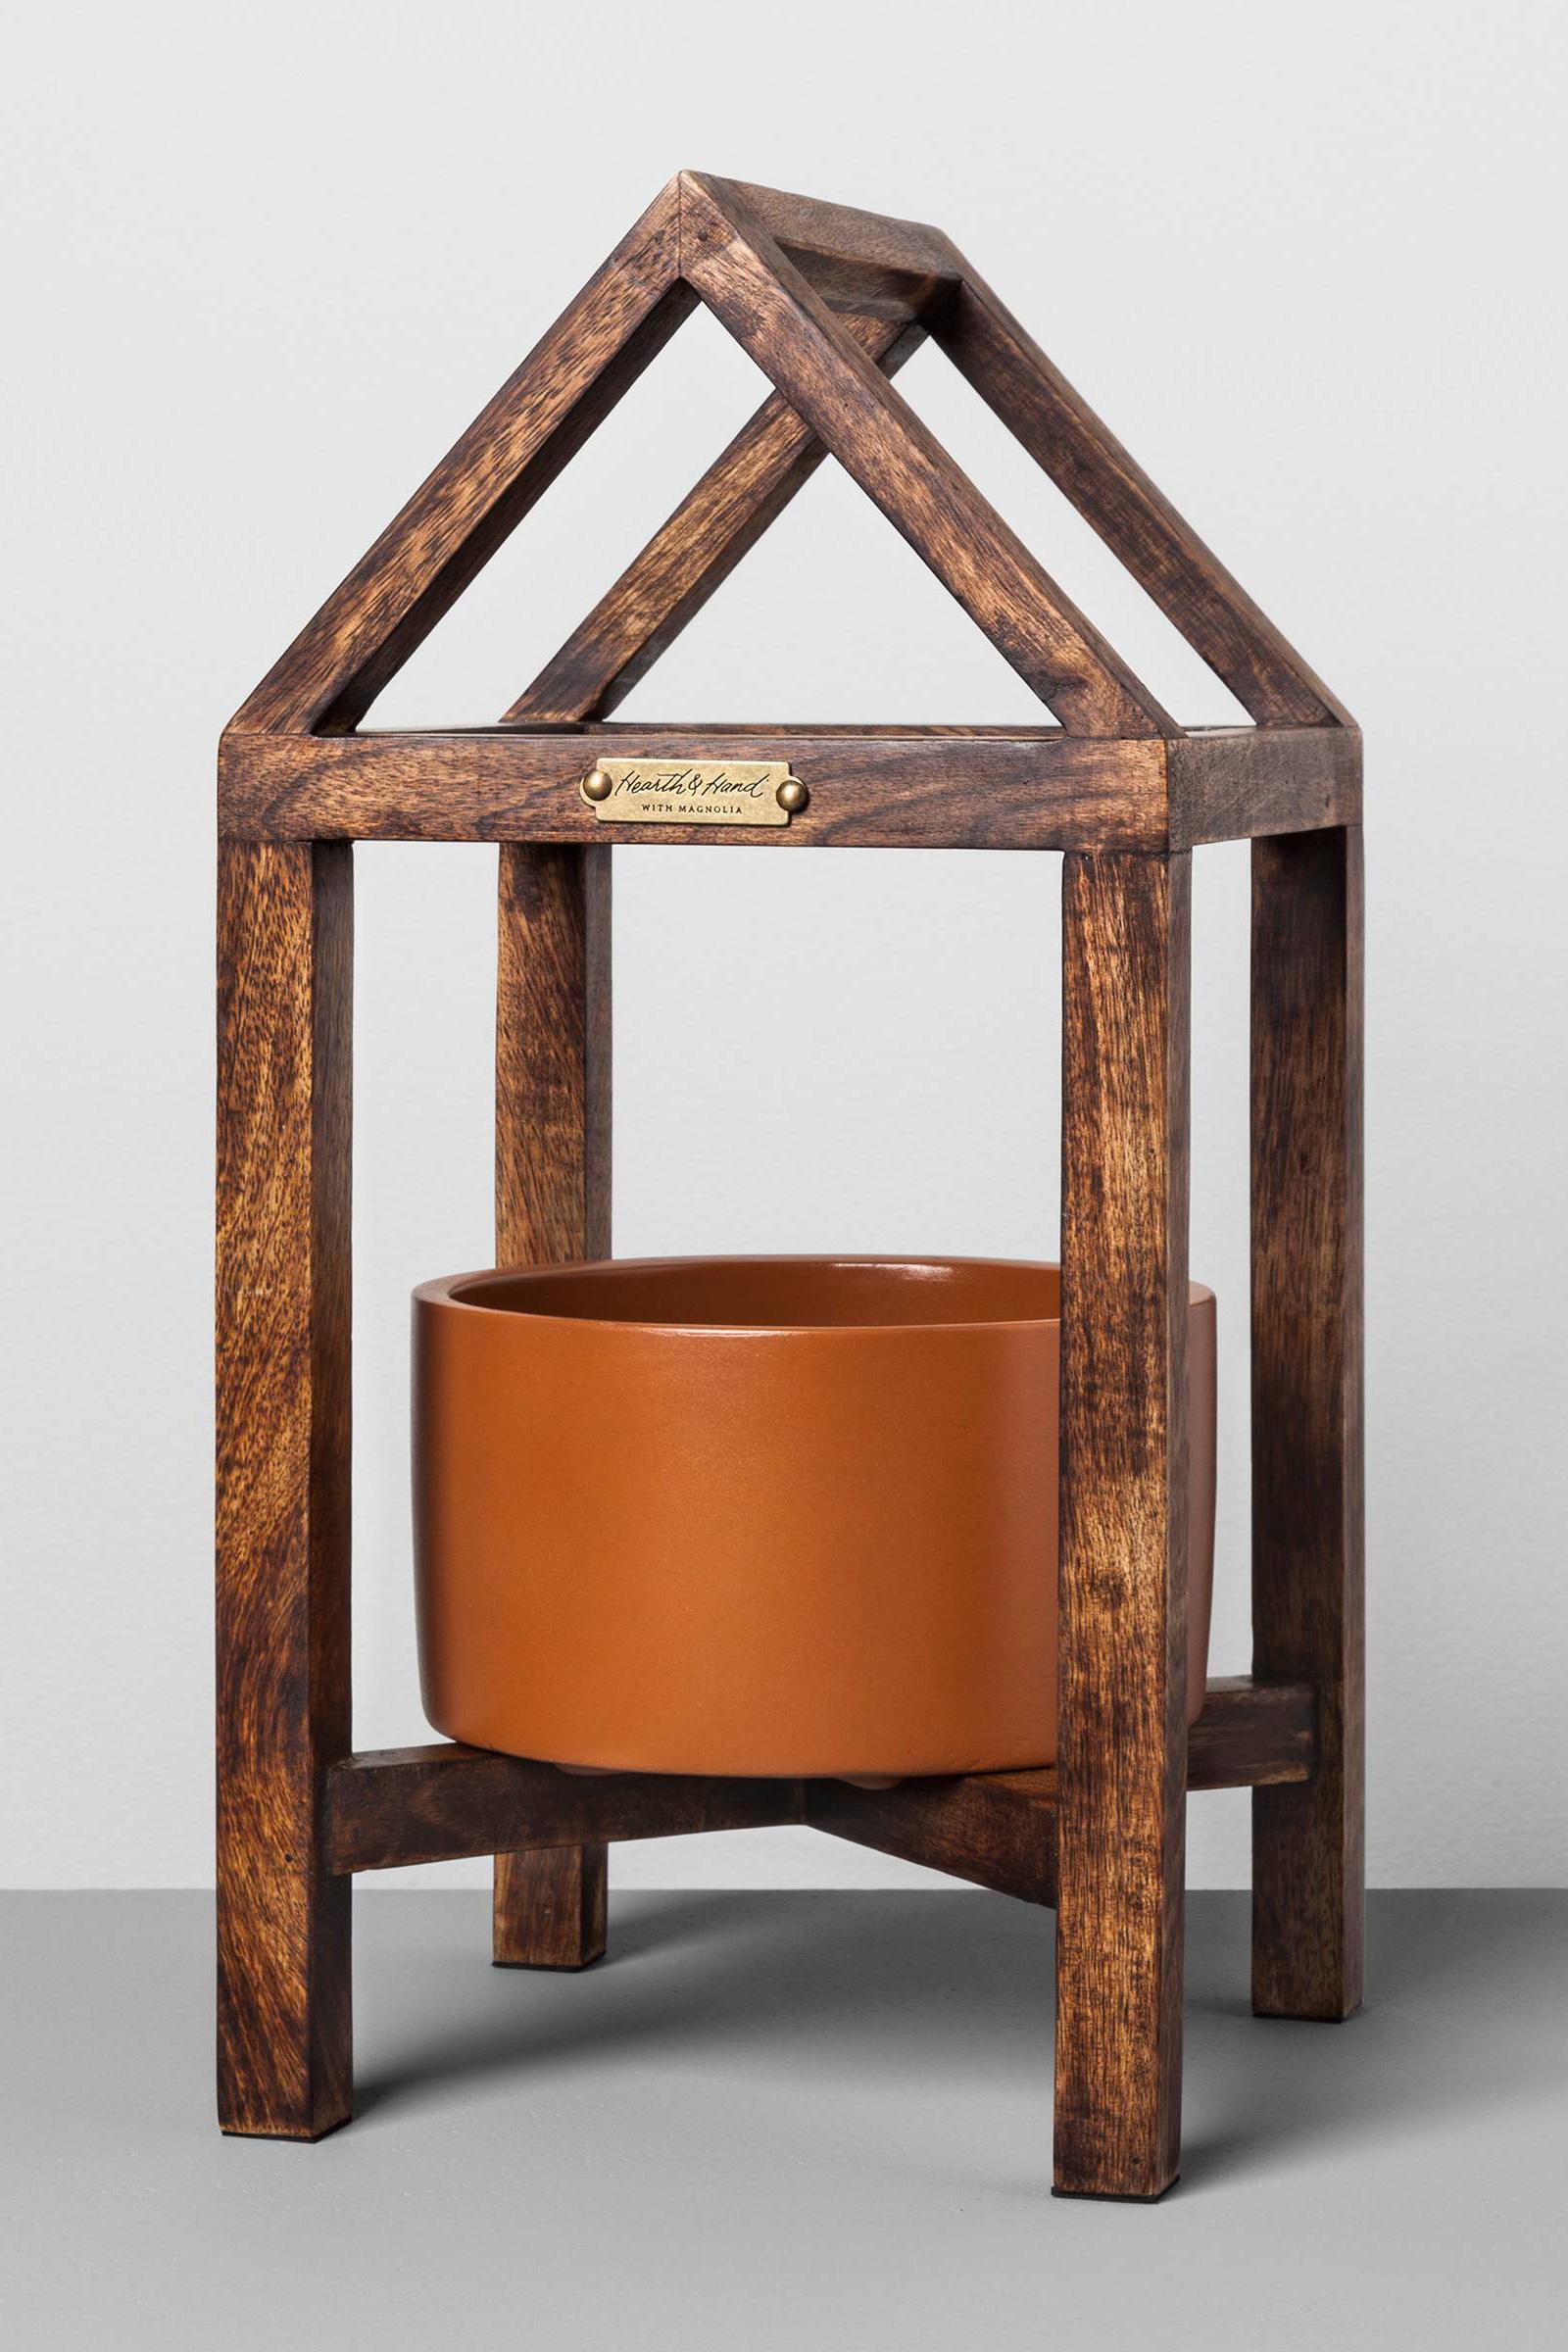 joanna gaines spring target collection spring 2018. Black Bedroom Furniture Sets. Home Design Ideas